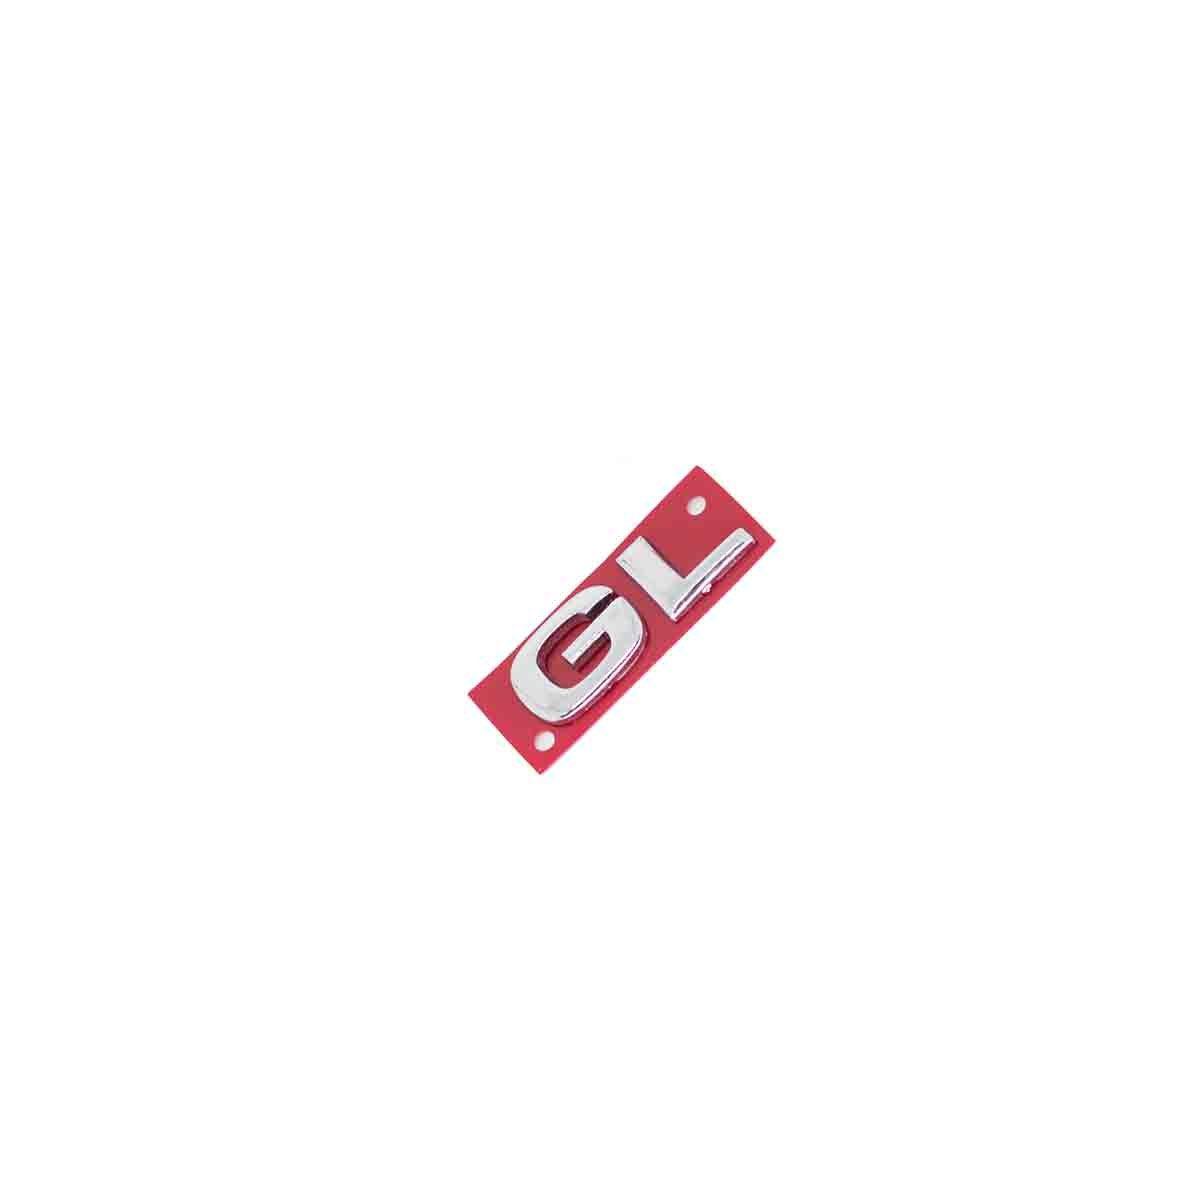 Emblema GL 02/03 Corsa/Astra/Meriva Cromado